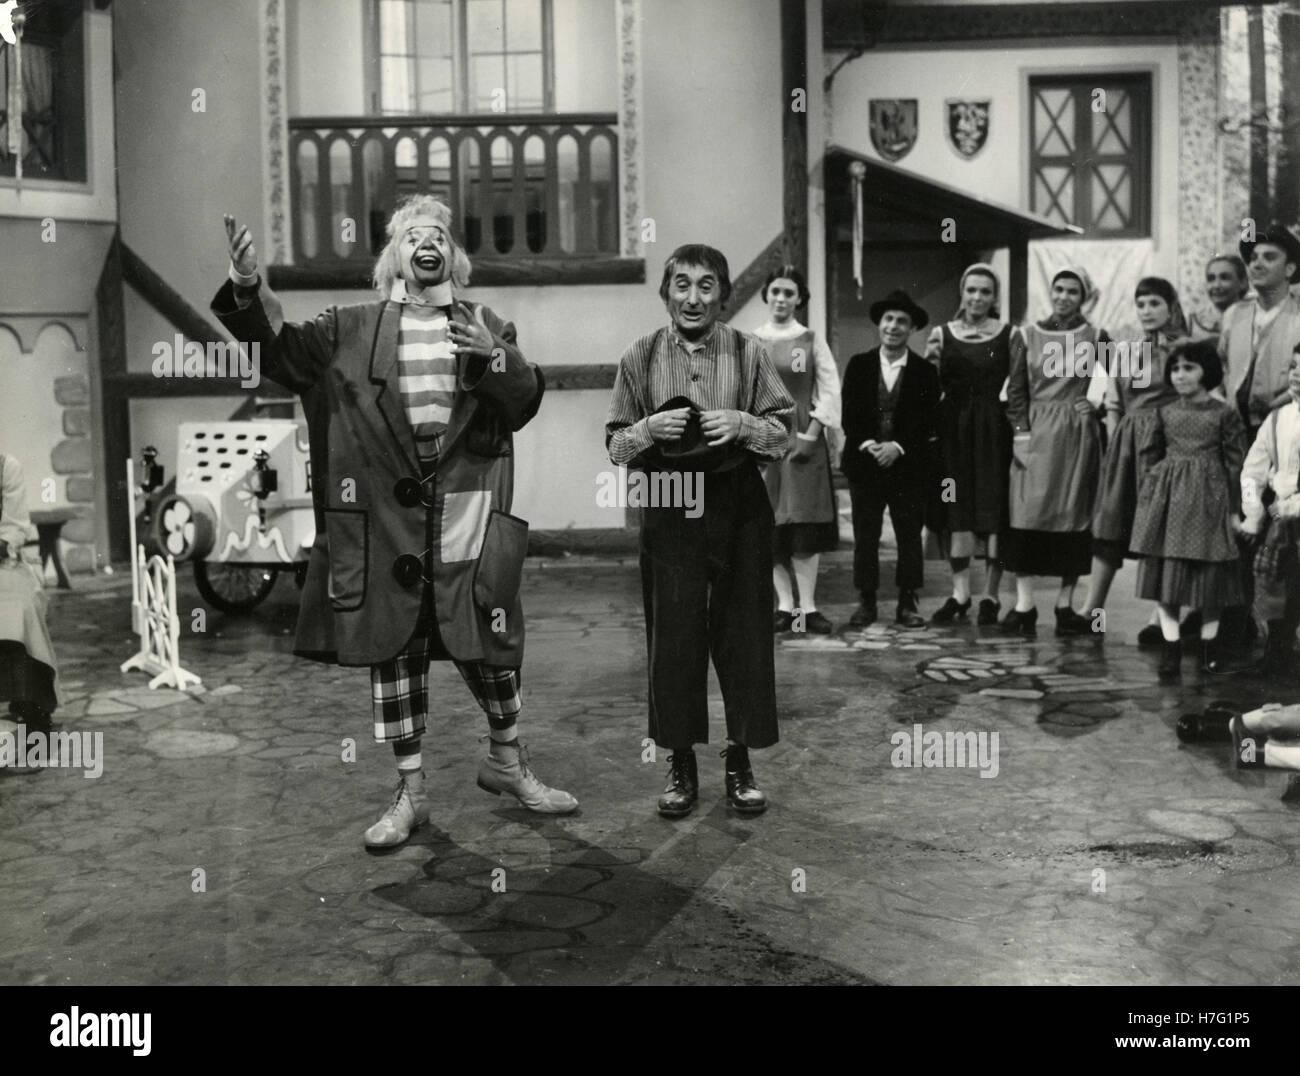 Italienischer Schauspieler Nino di Napoli in der TV-Fiktion Fred Buonumore, Italien 1968 Stockbild